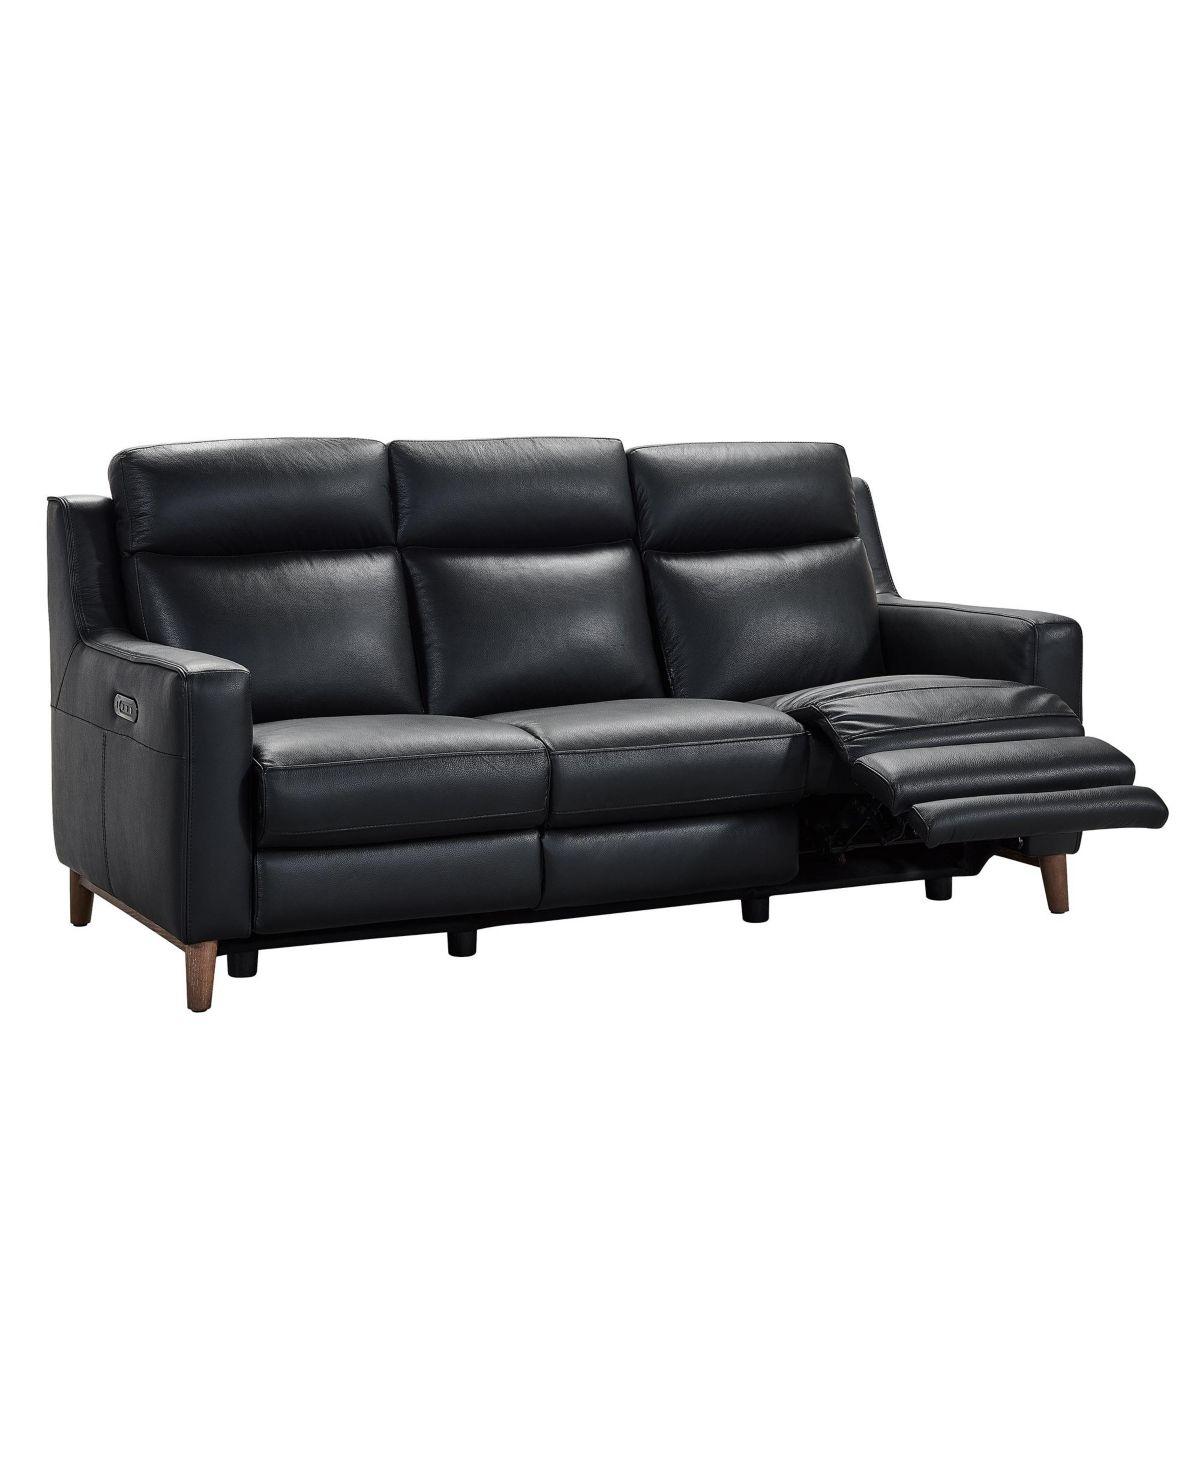 - Wisteria Reclining Sofa - Black In 2020 Genuine Leather Sofa